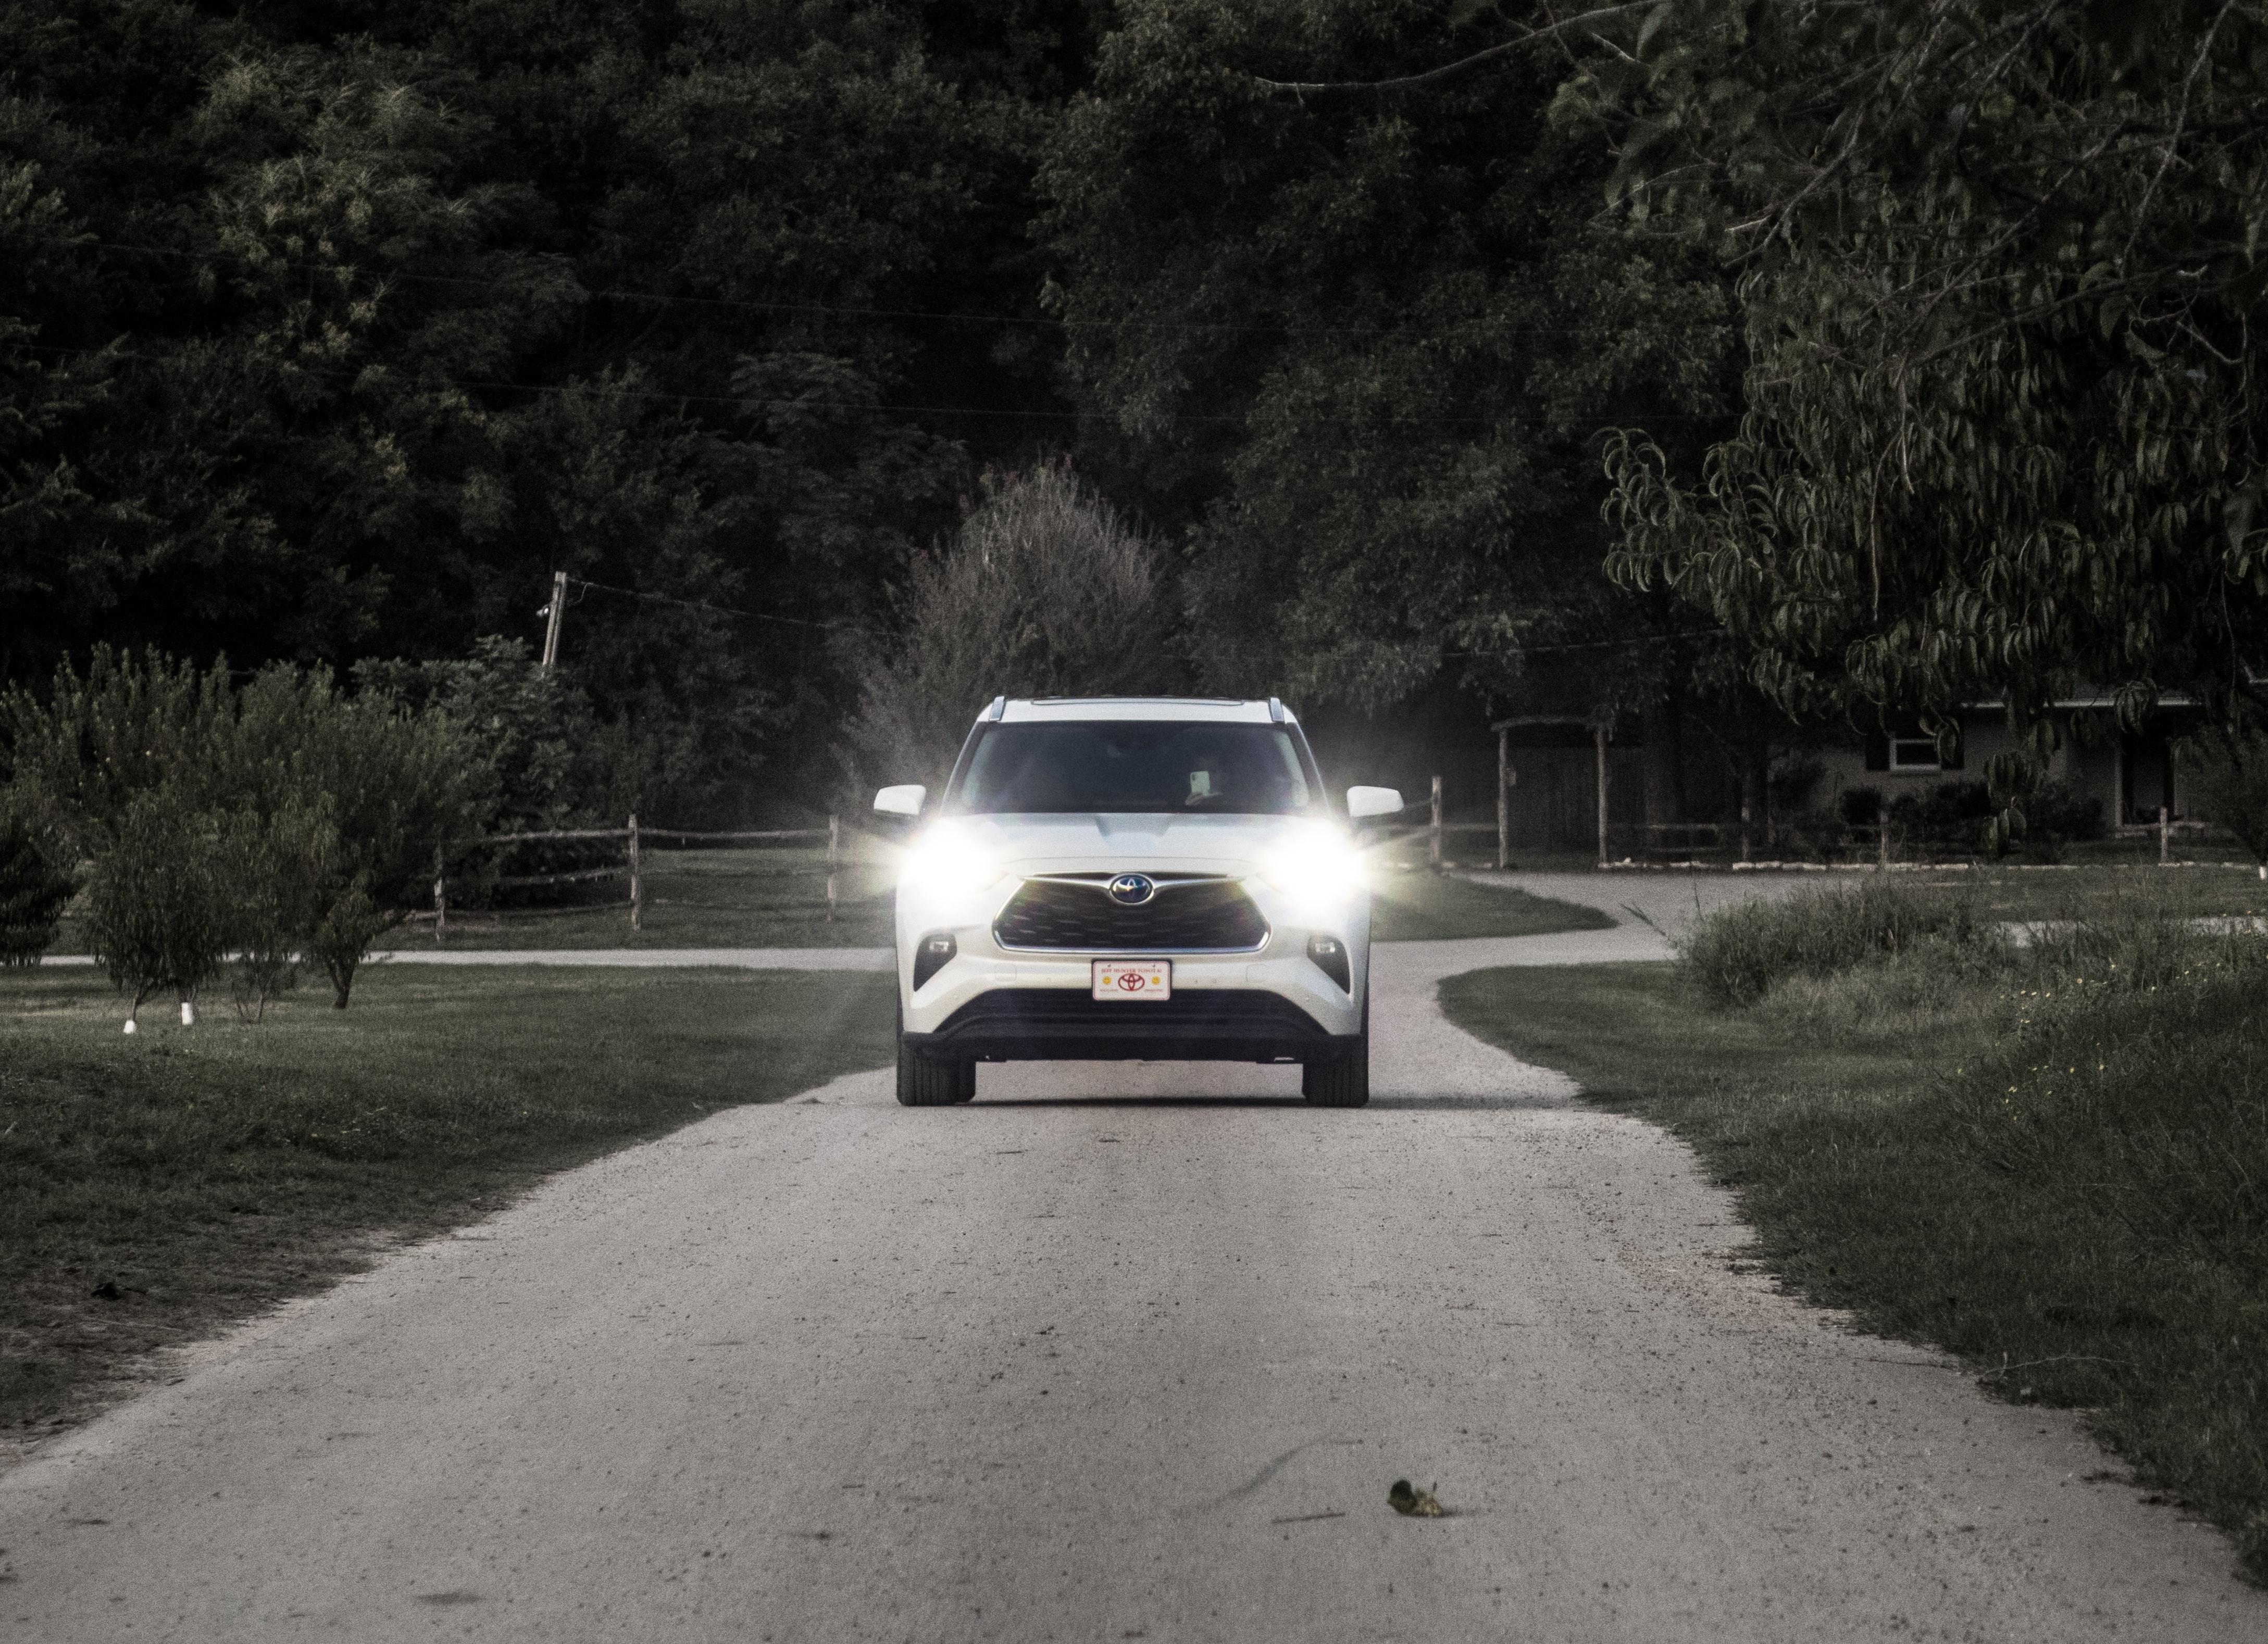 A white Toyota Highlander driving down a gray asphalt farm road.